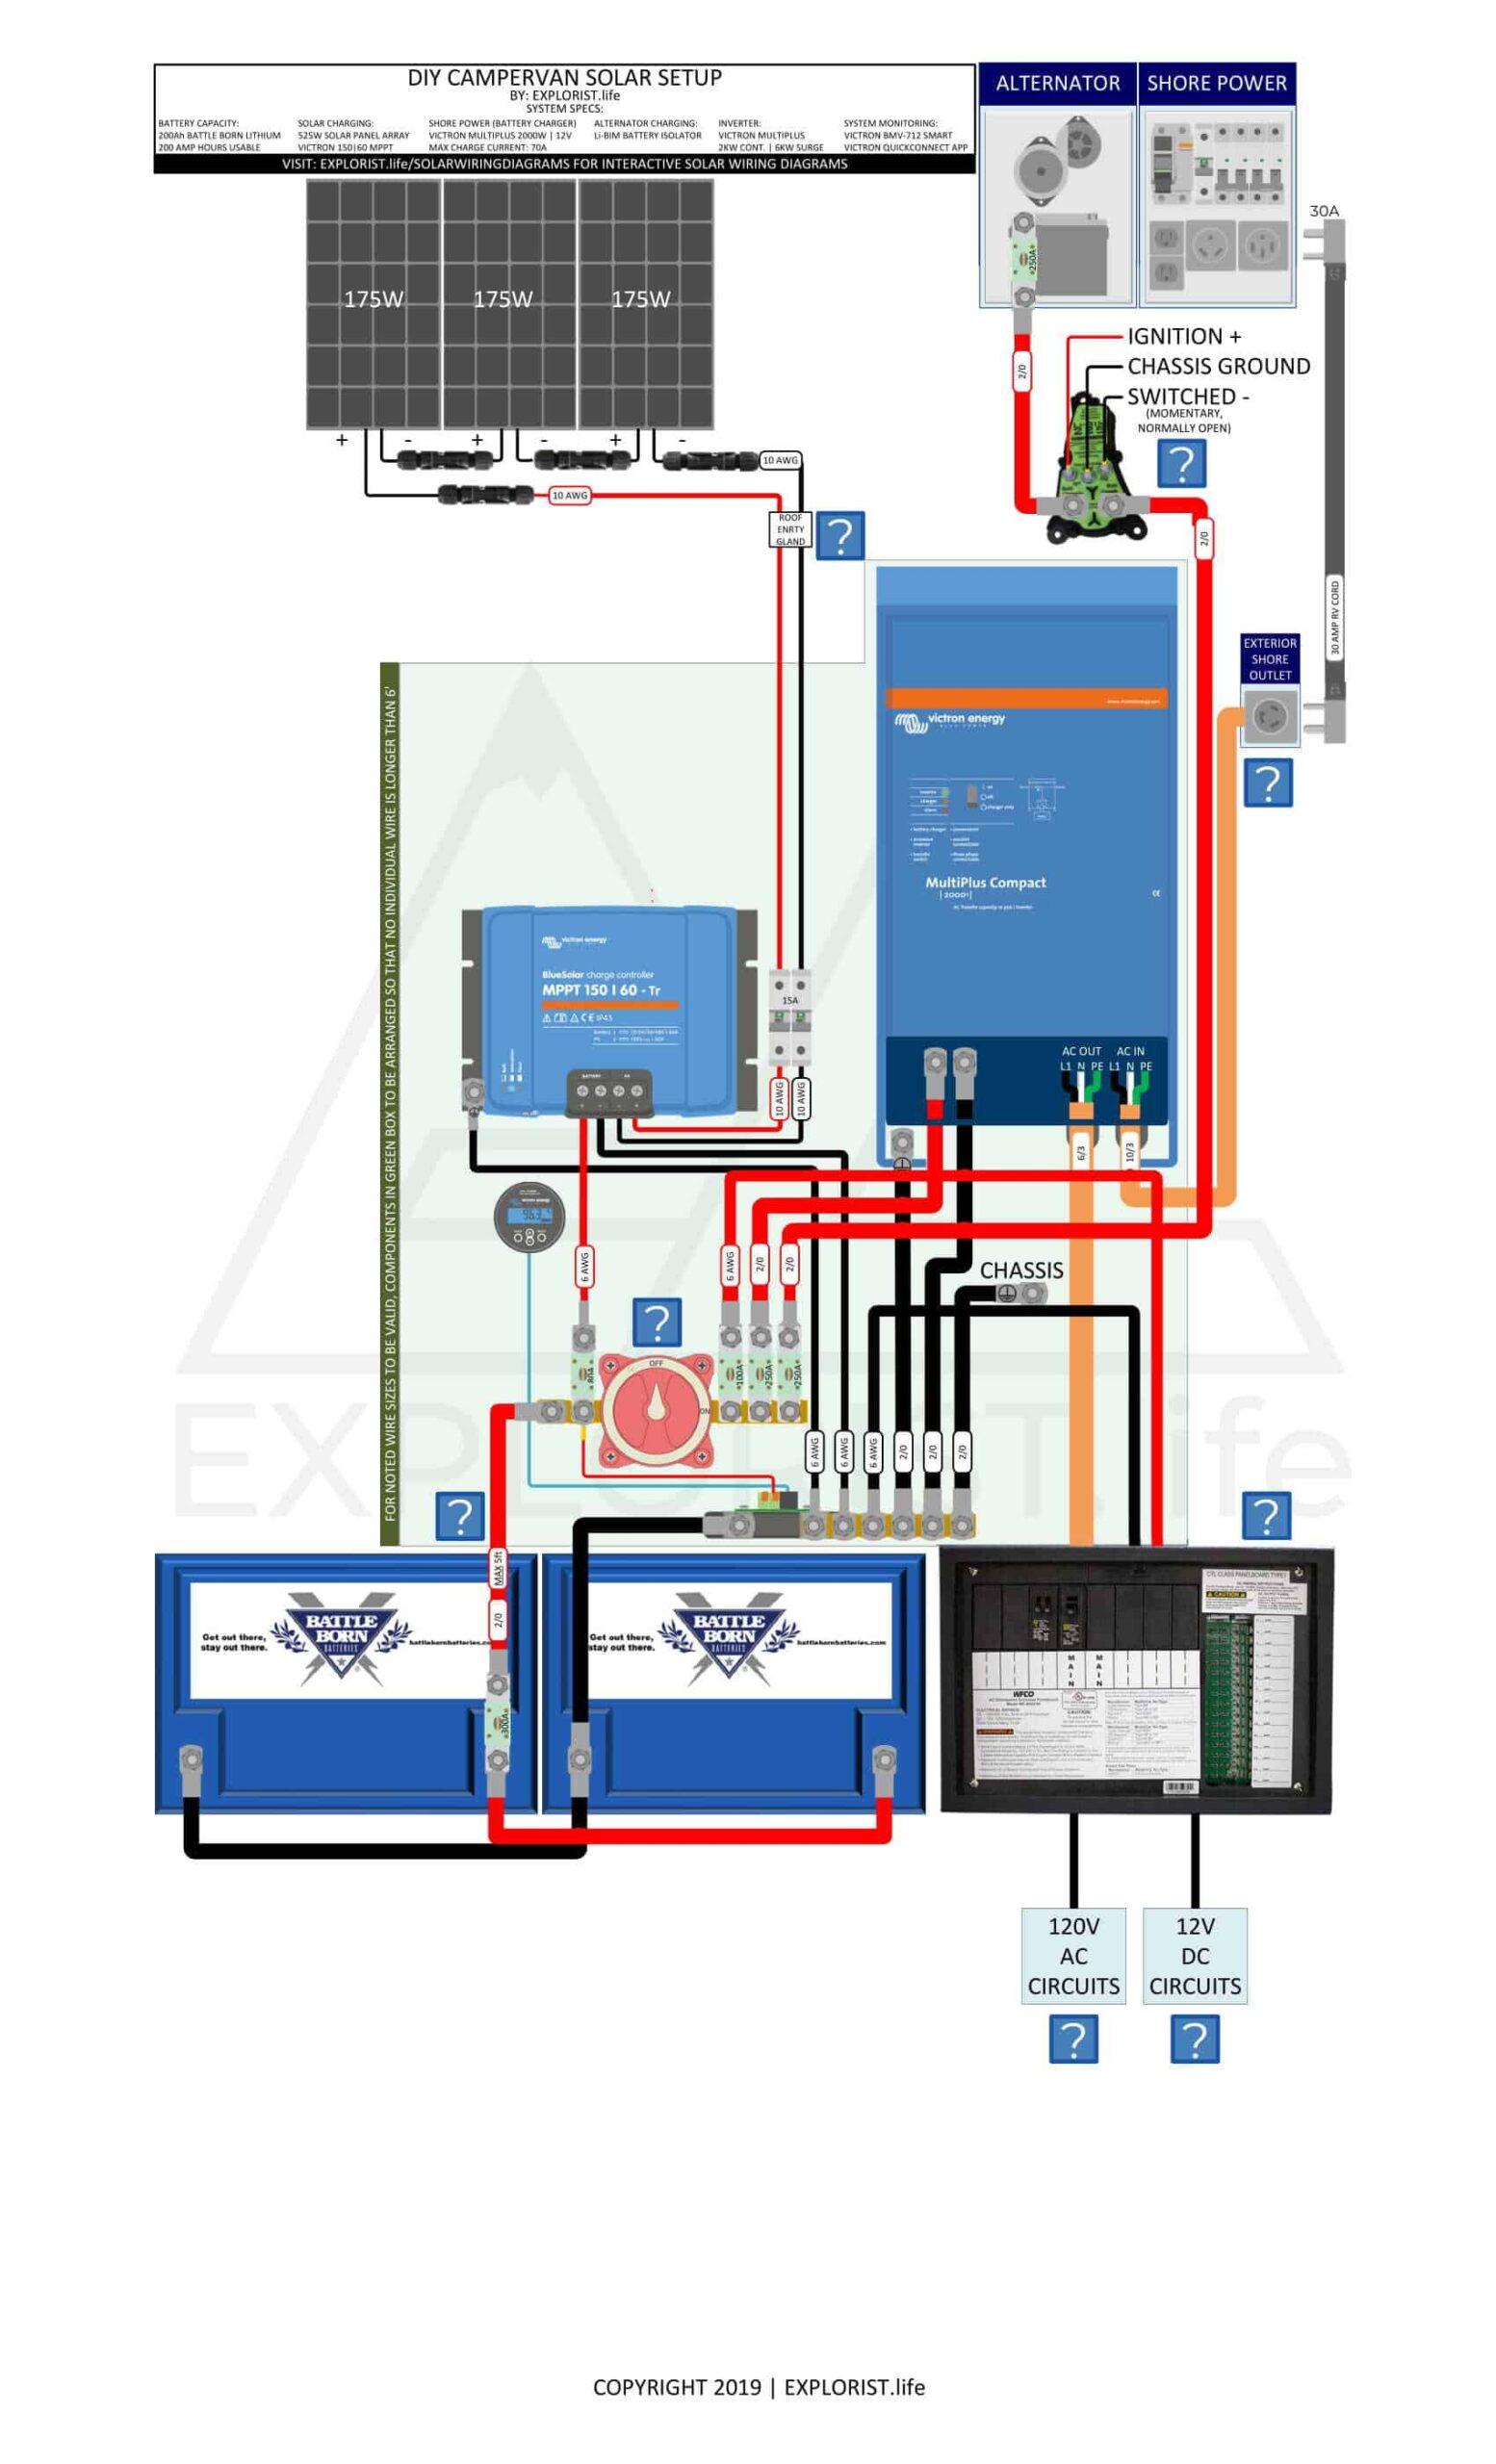 200Ah Lithium Battery Bank – 3x175W Solar – 2kW Inverter/Charger – Li-BIM Alternator Charging